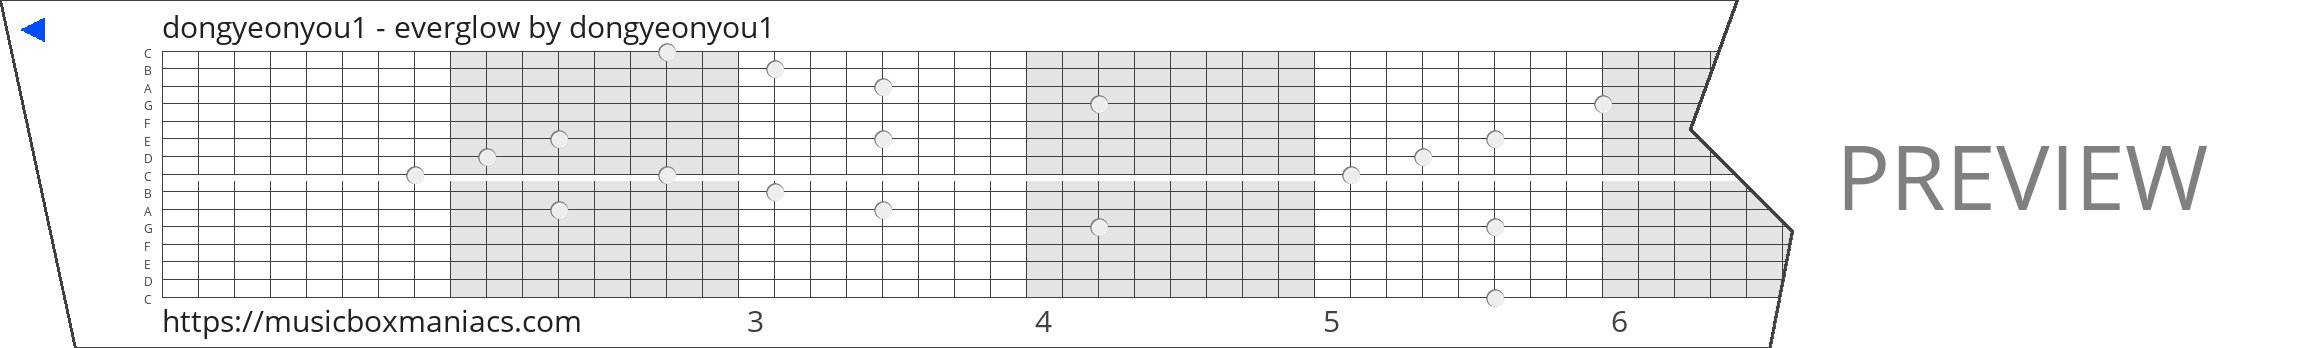 dongyeonyou1 - everglow 15 note music box paper strip